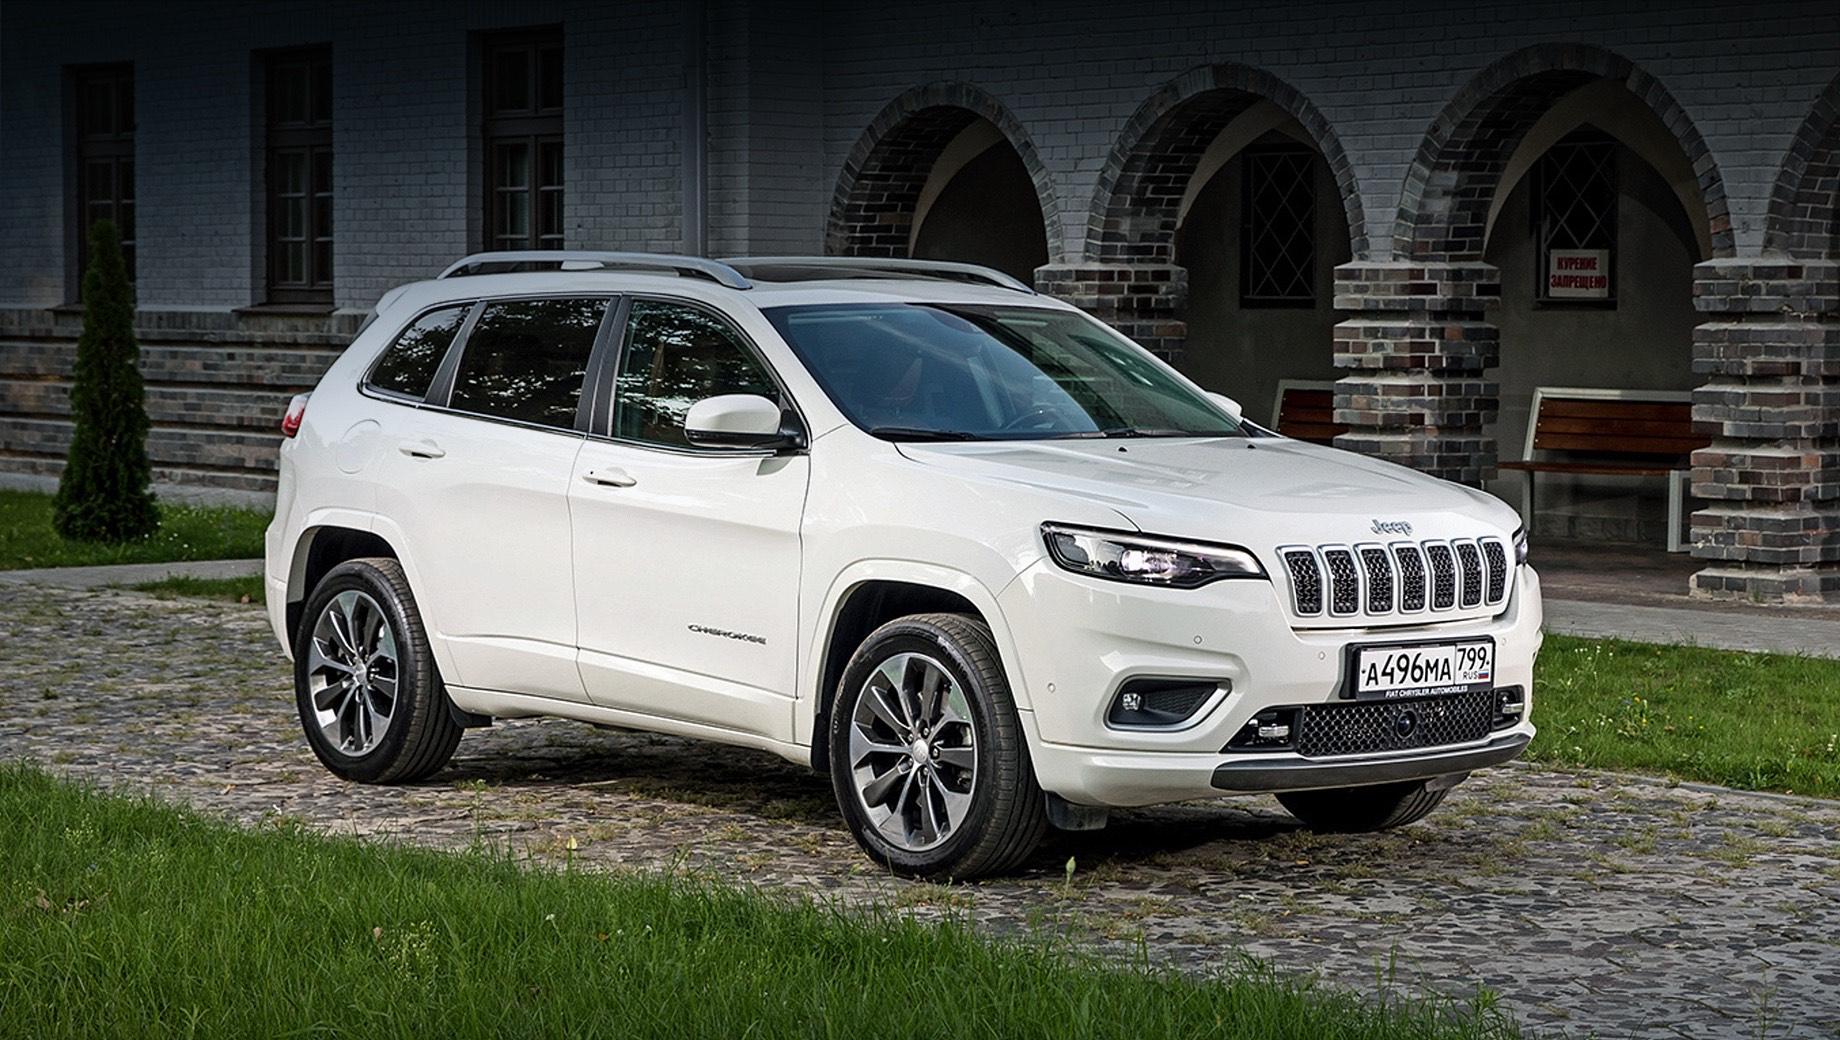 Кроссовер Jeep Cherokee покинул российский рынок